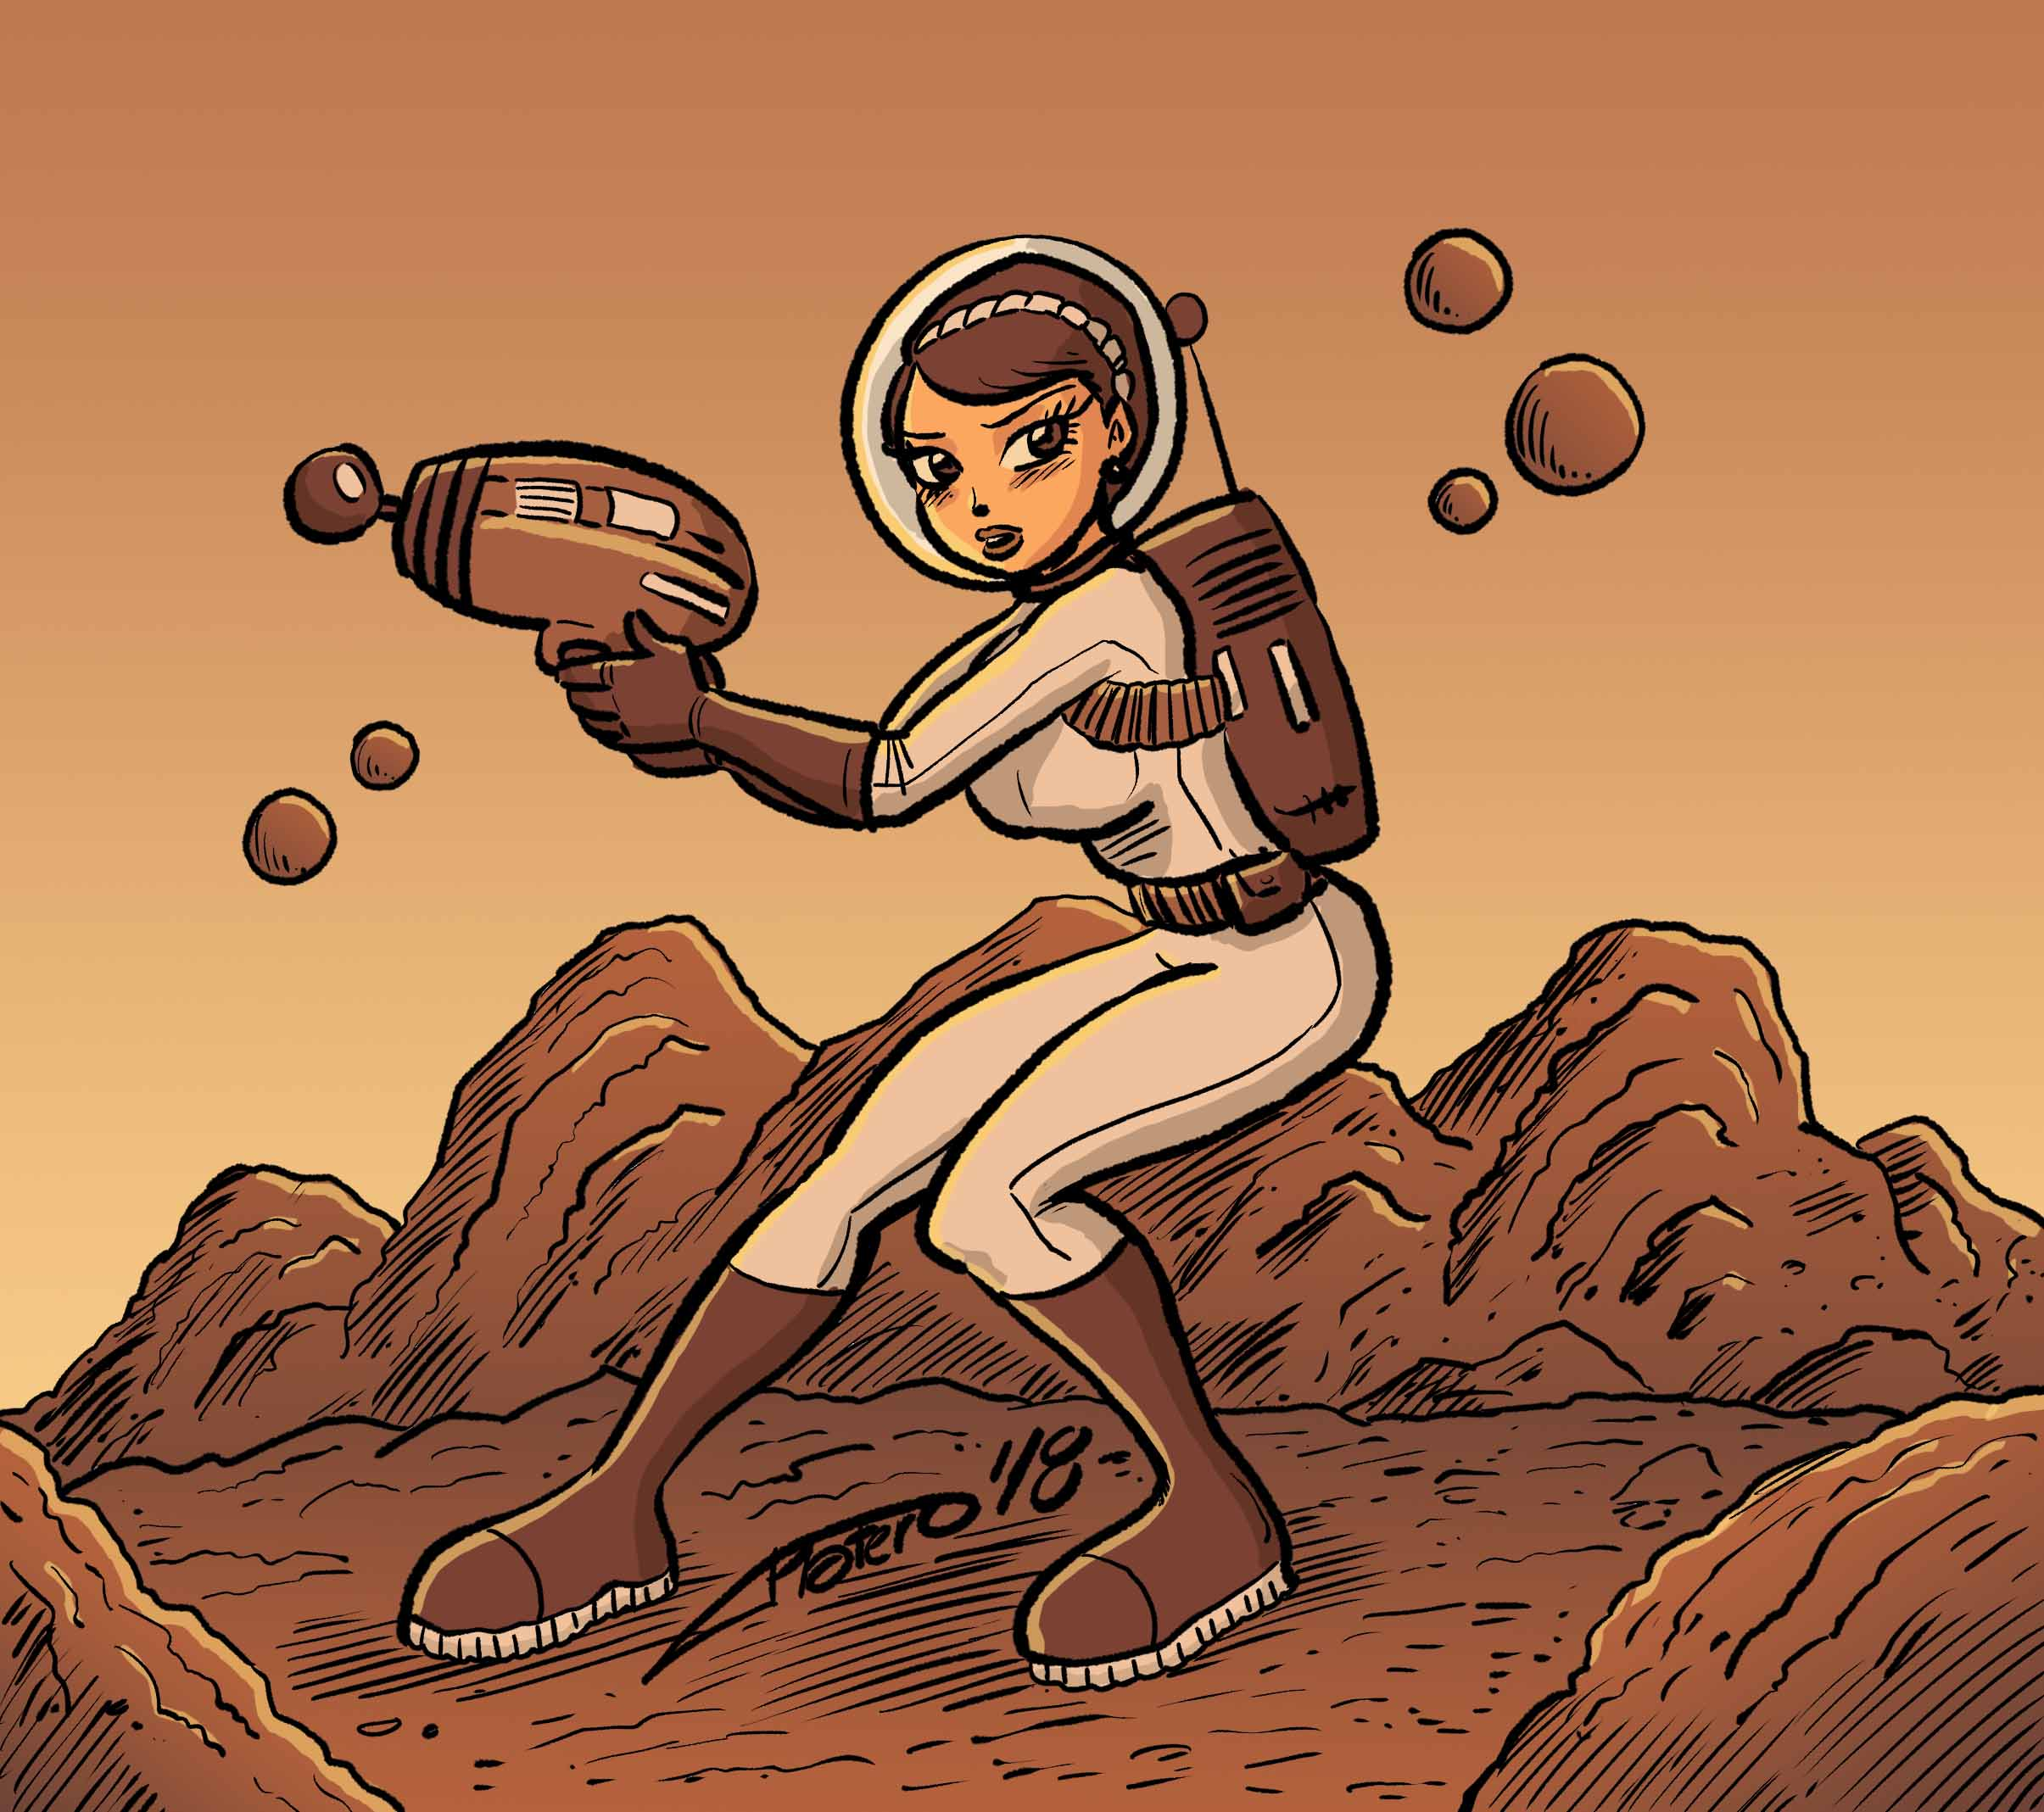 chica_astronauta_mujer_girl_woman_espaci